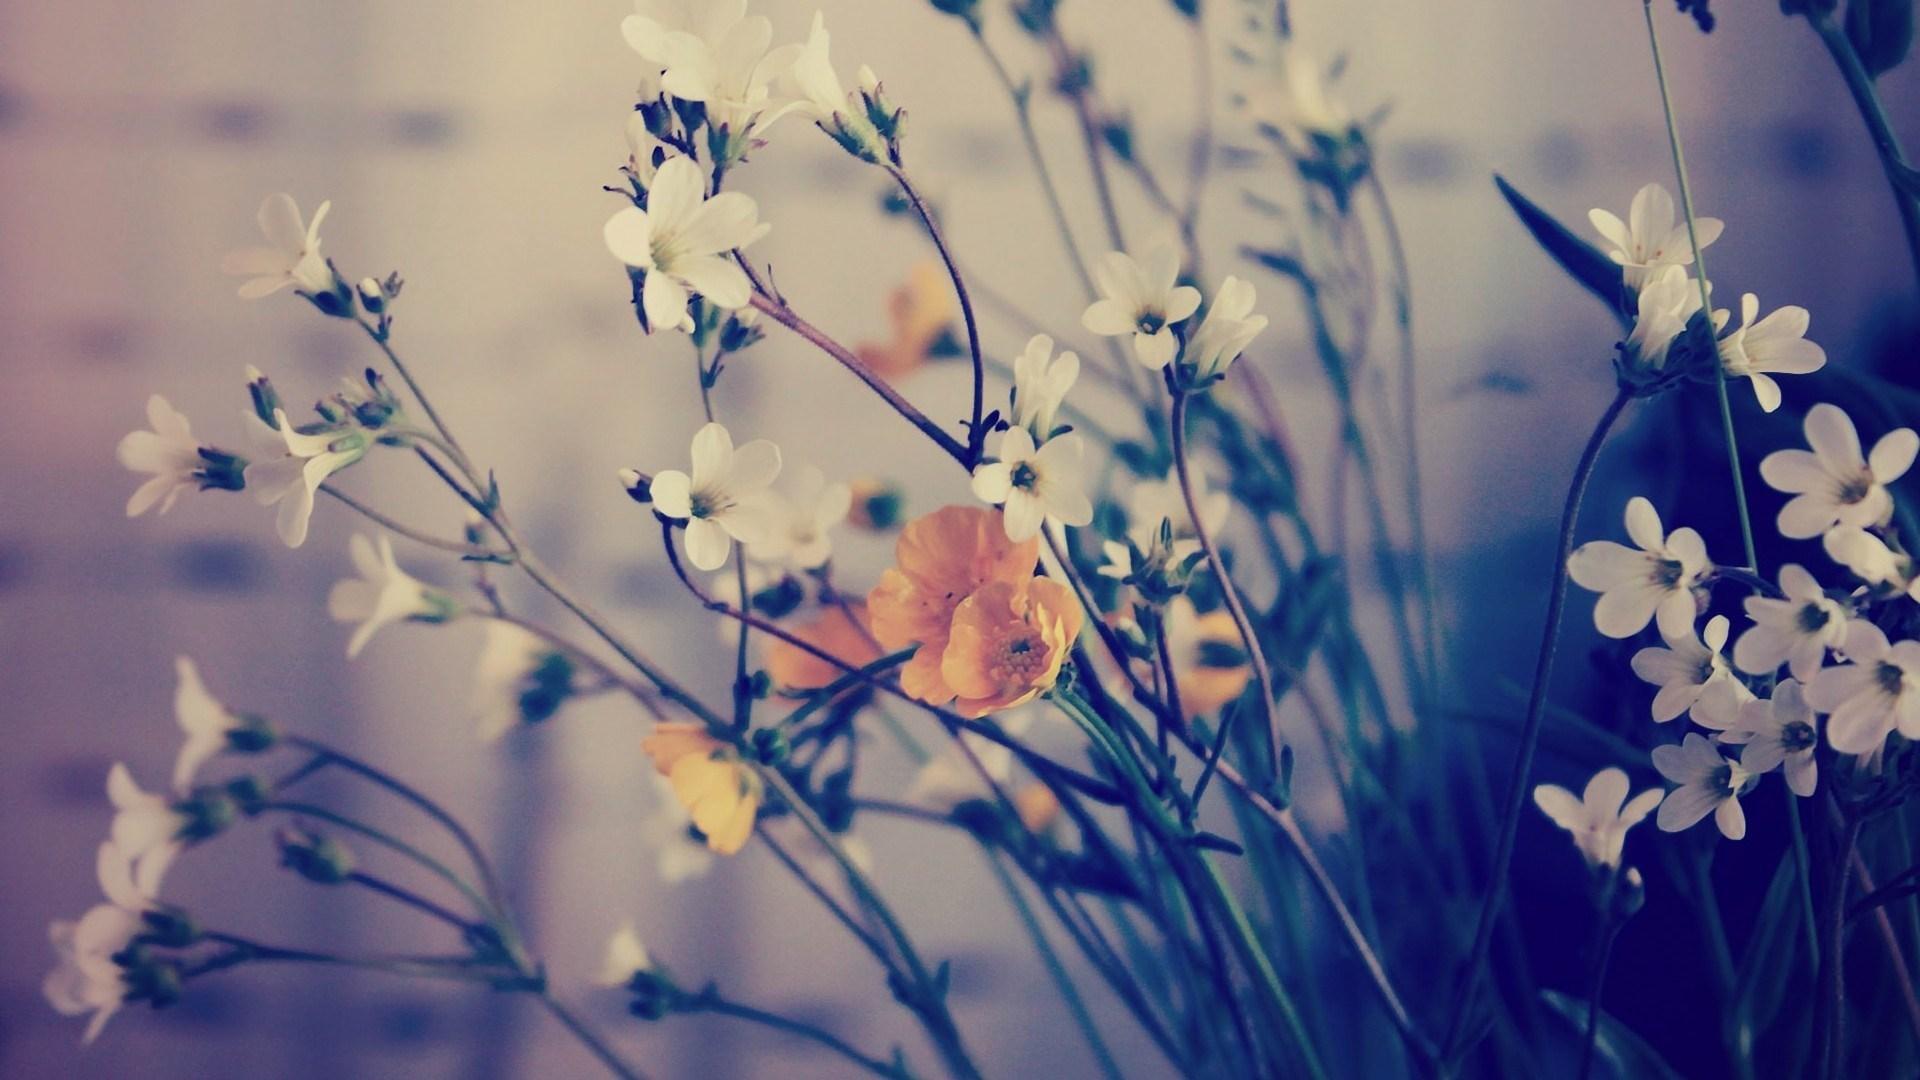 flowers macro photo